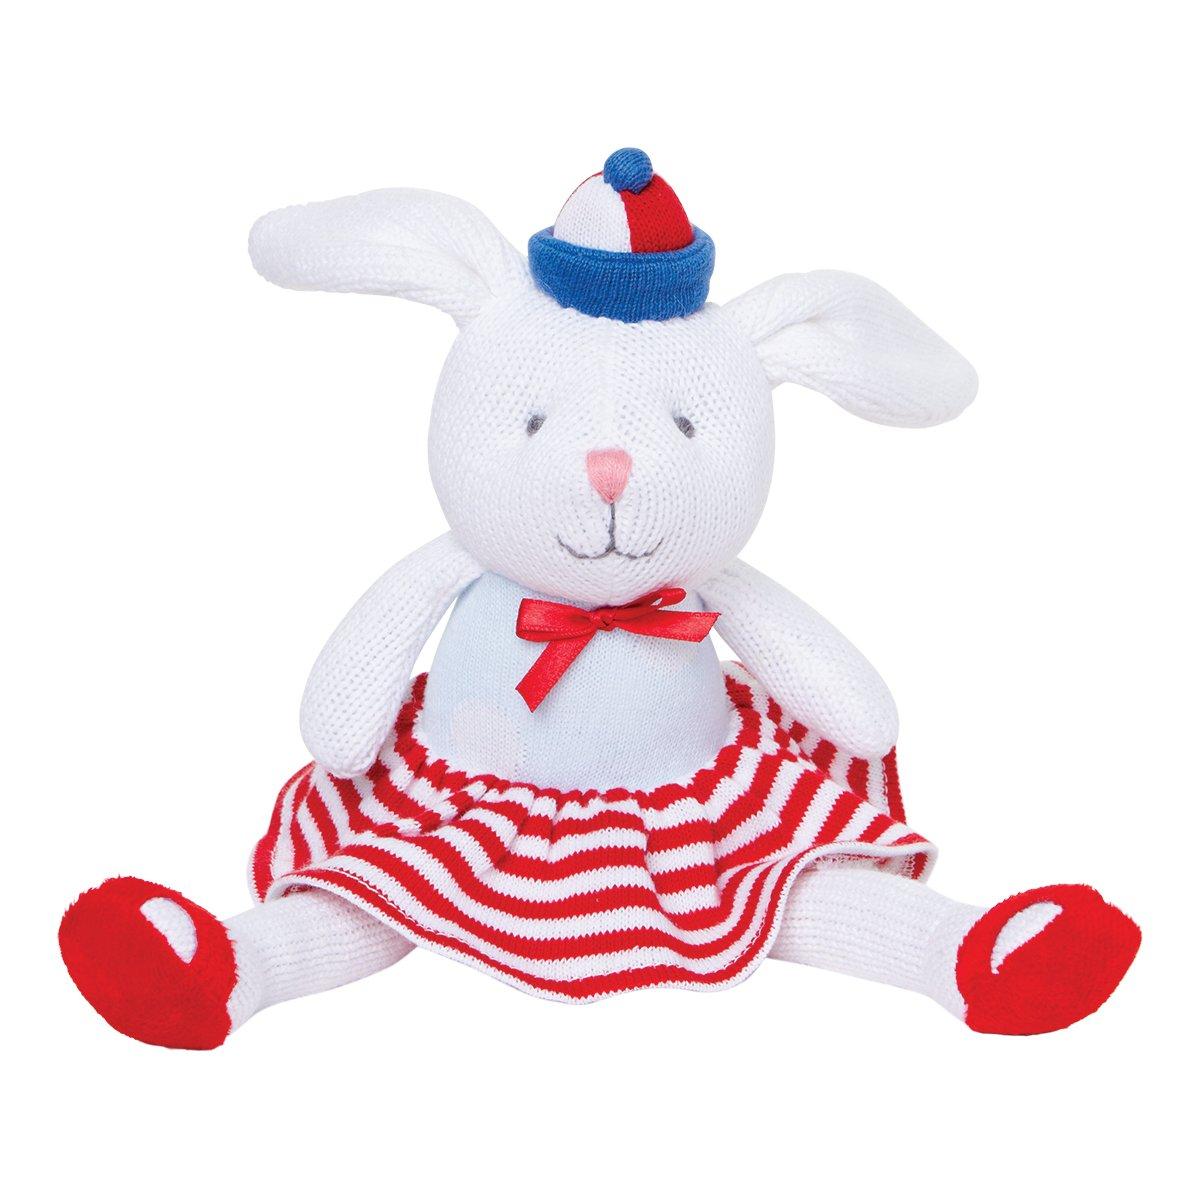 Elegant Baby Knitted Knittie Nautical Oklahoma City Mall 10